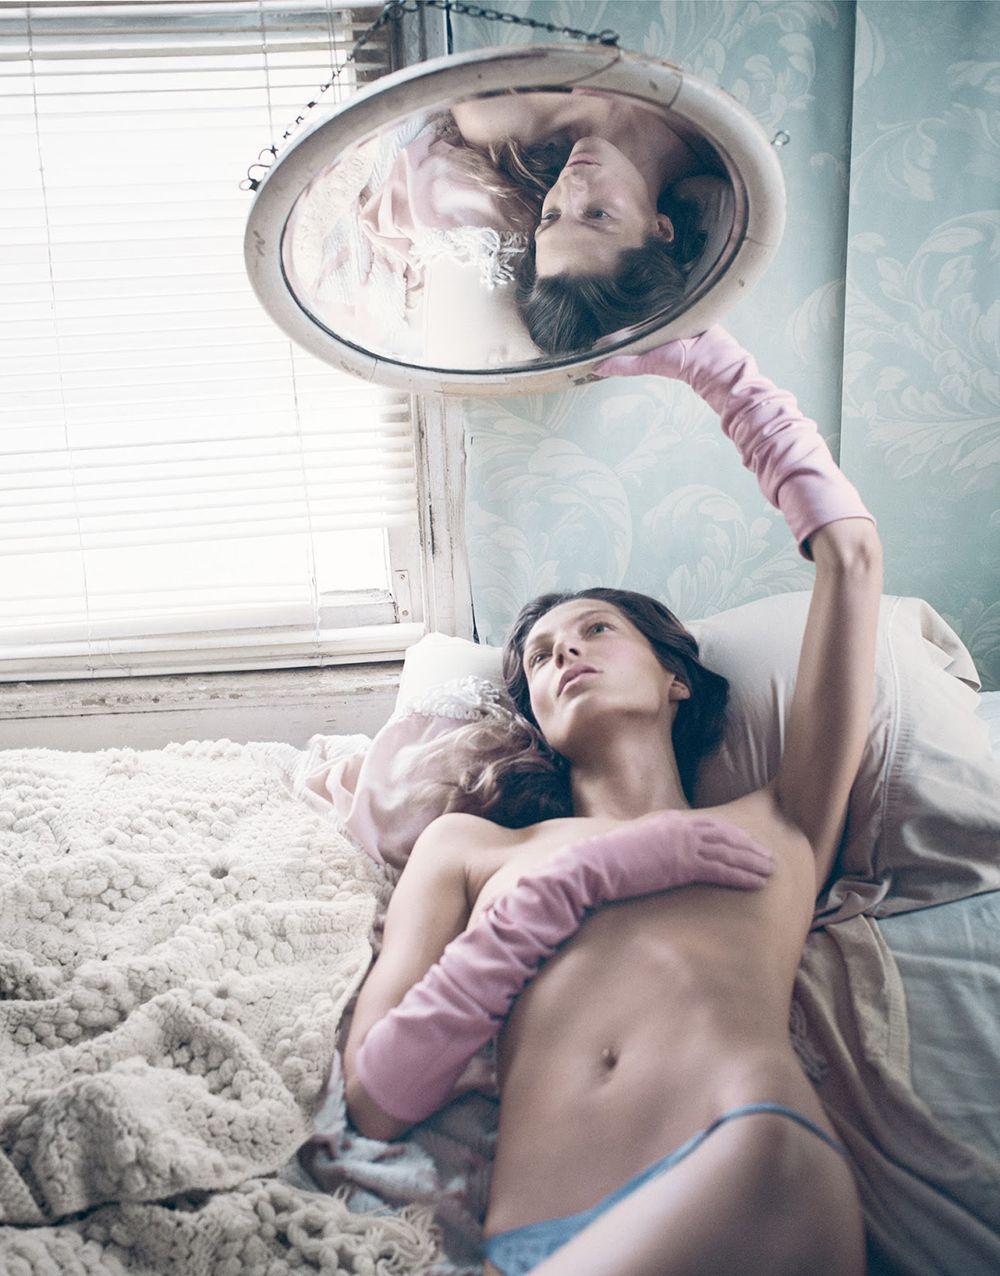 Daria Werbowy Topless Pho...